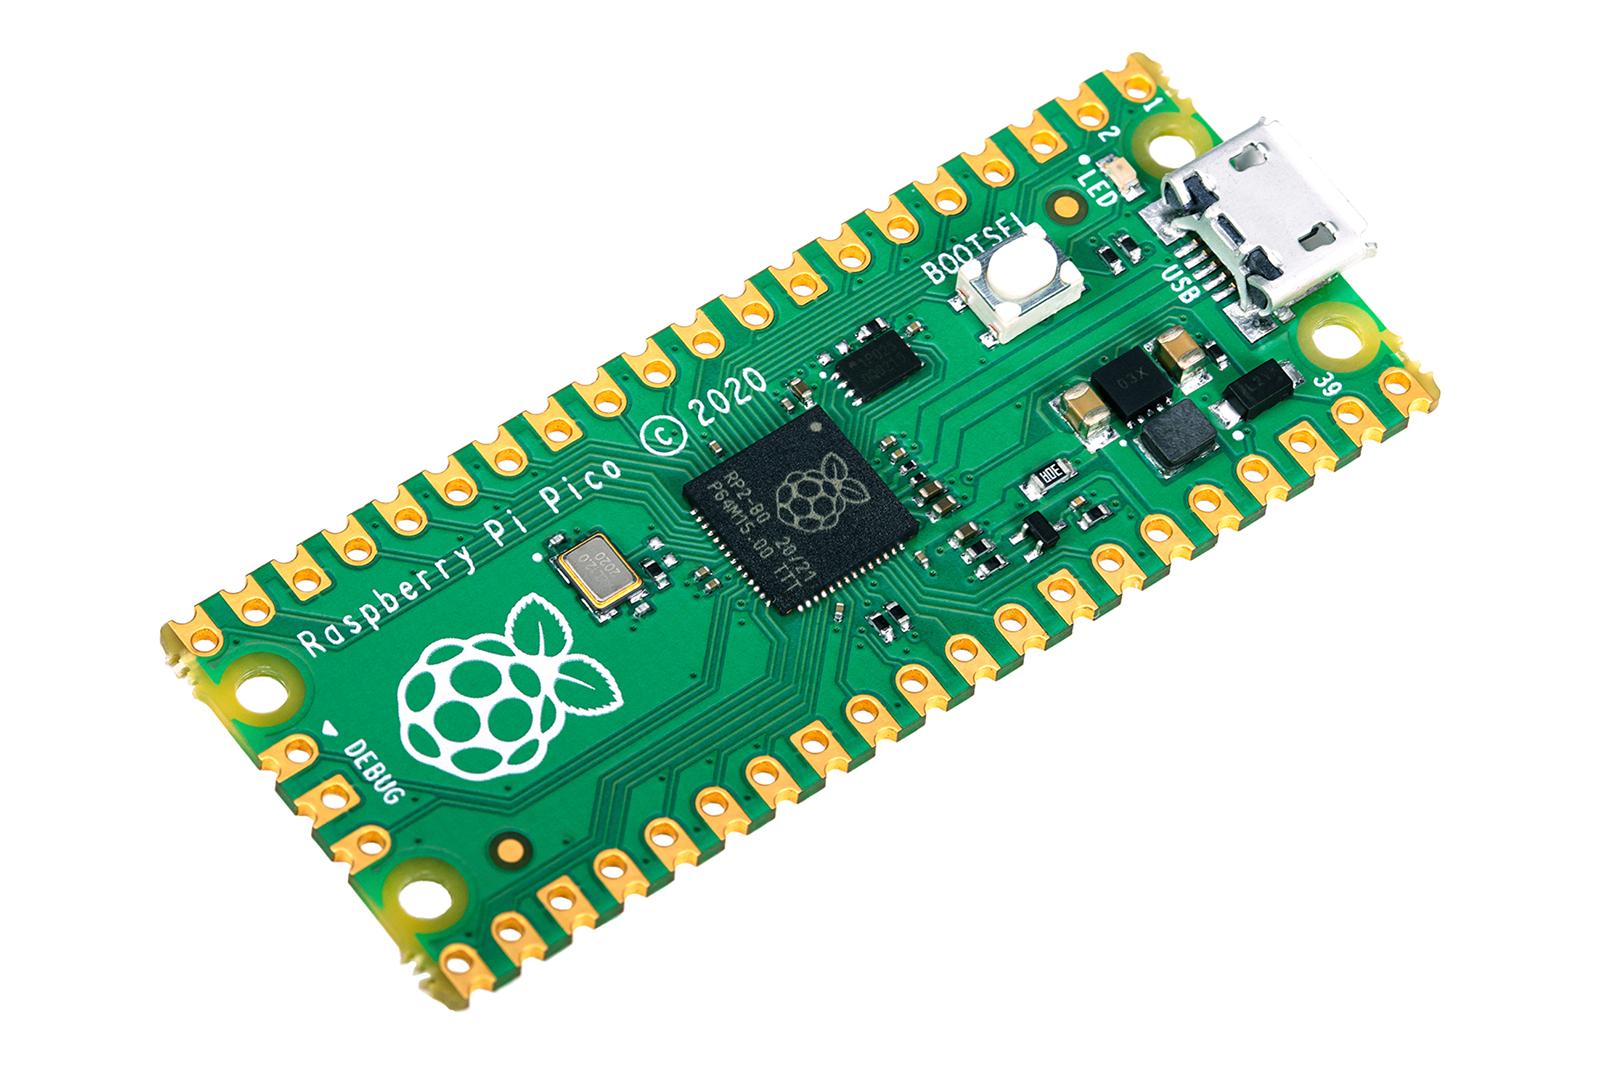 Raspberry Pi Pico is a $4 Arduino alternative – Yahoo Finance Australia